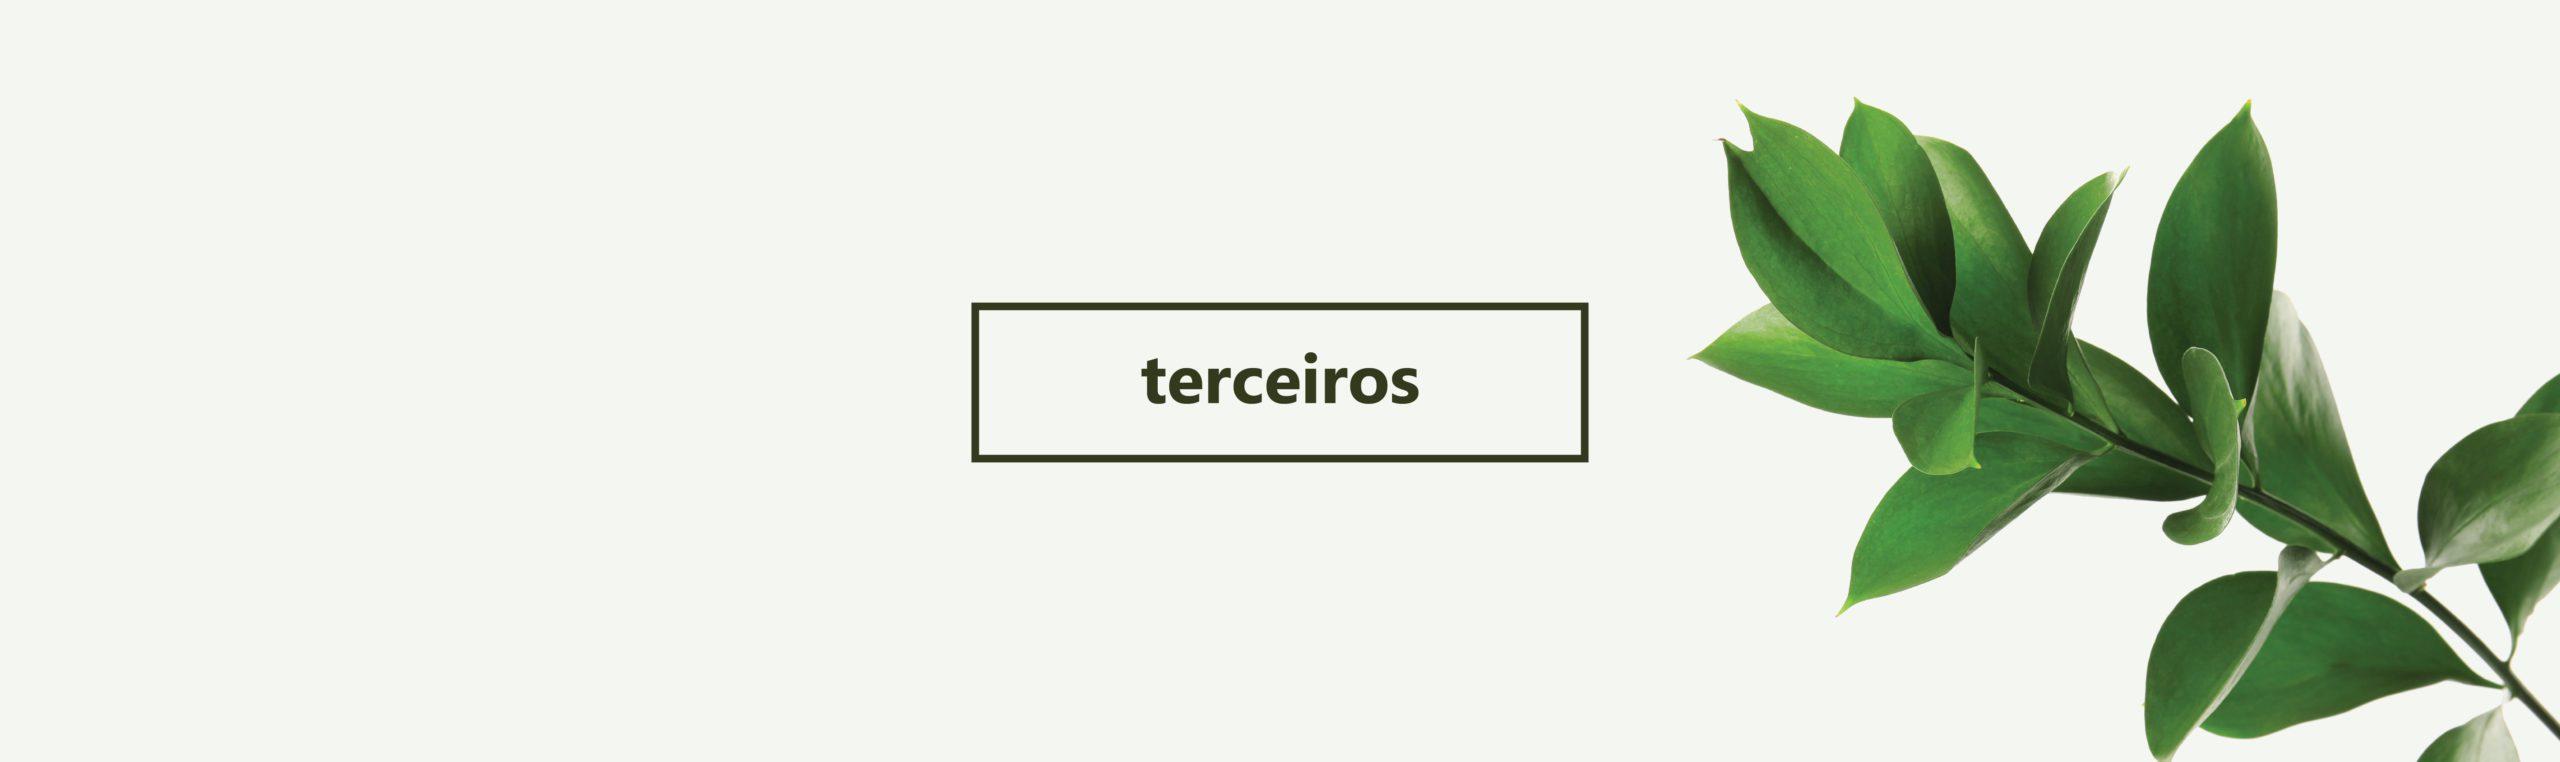 Terceiros